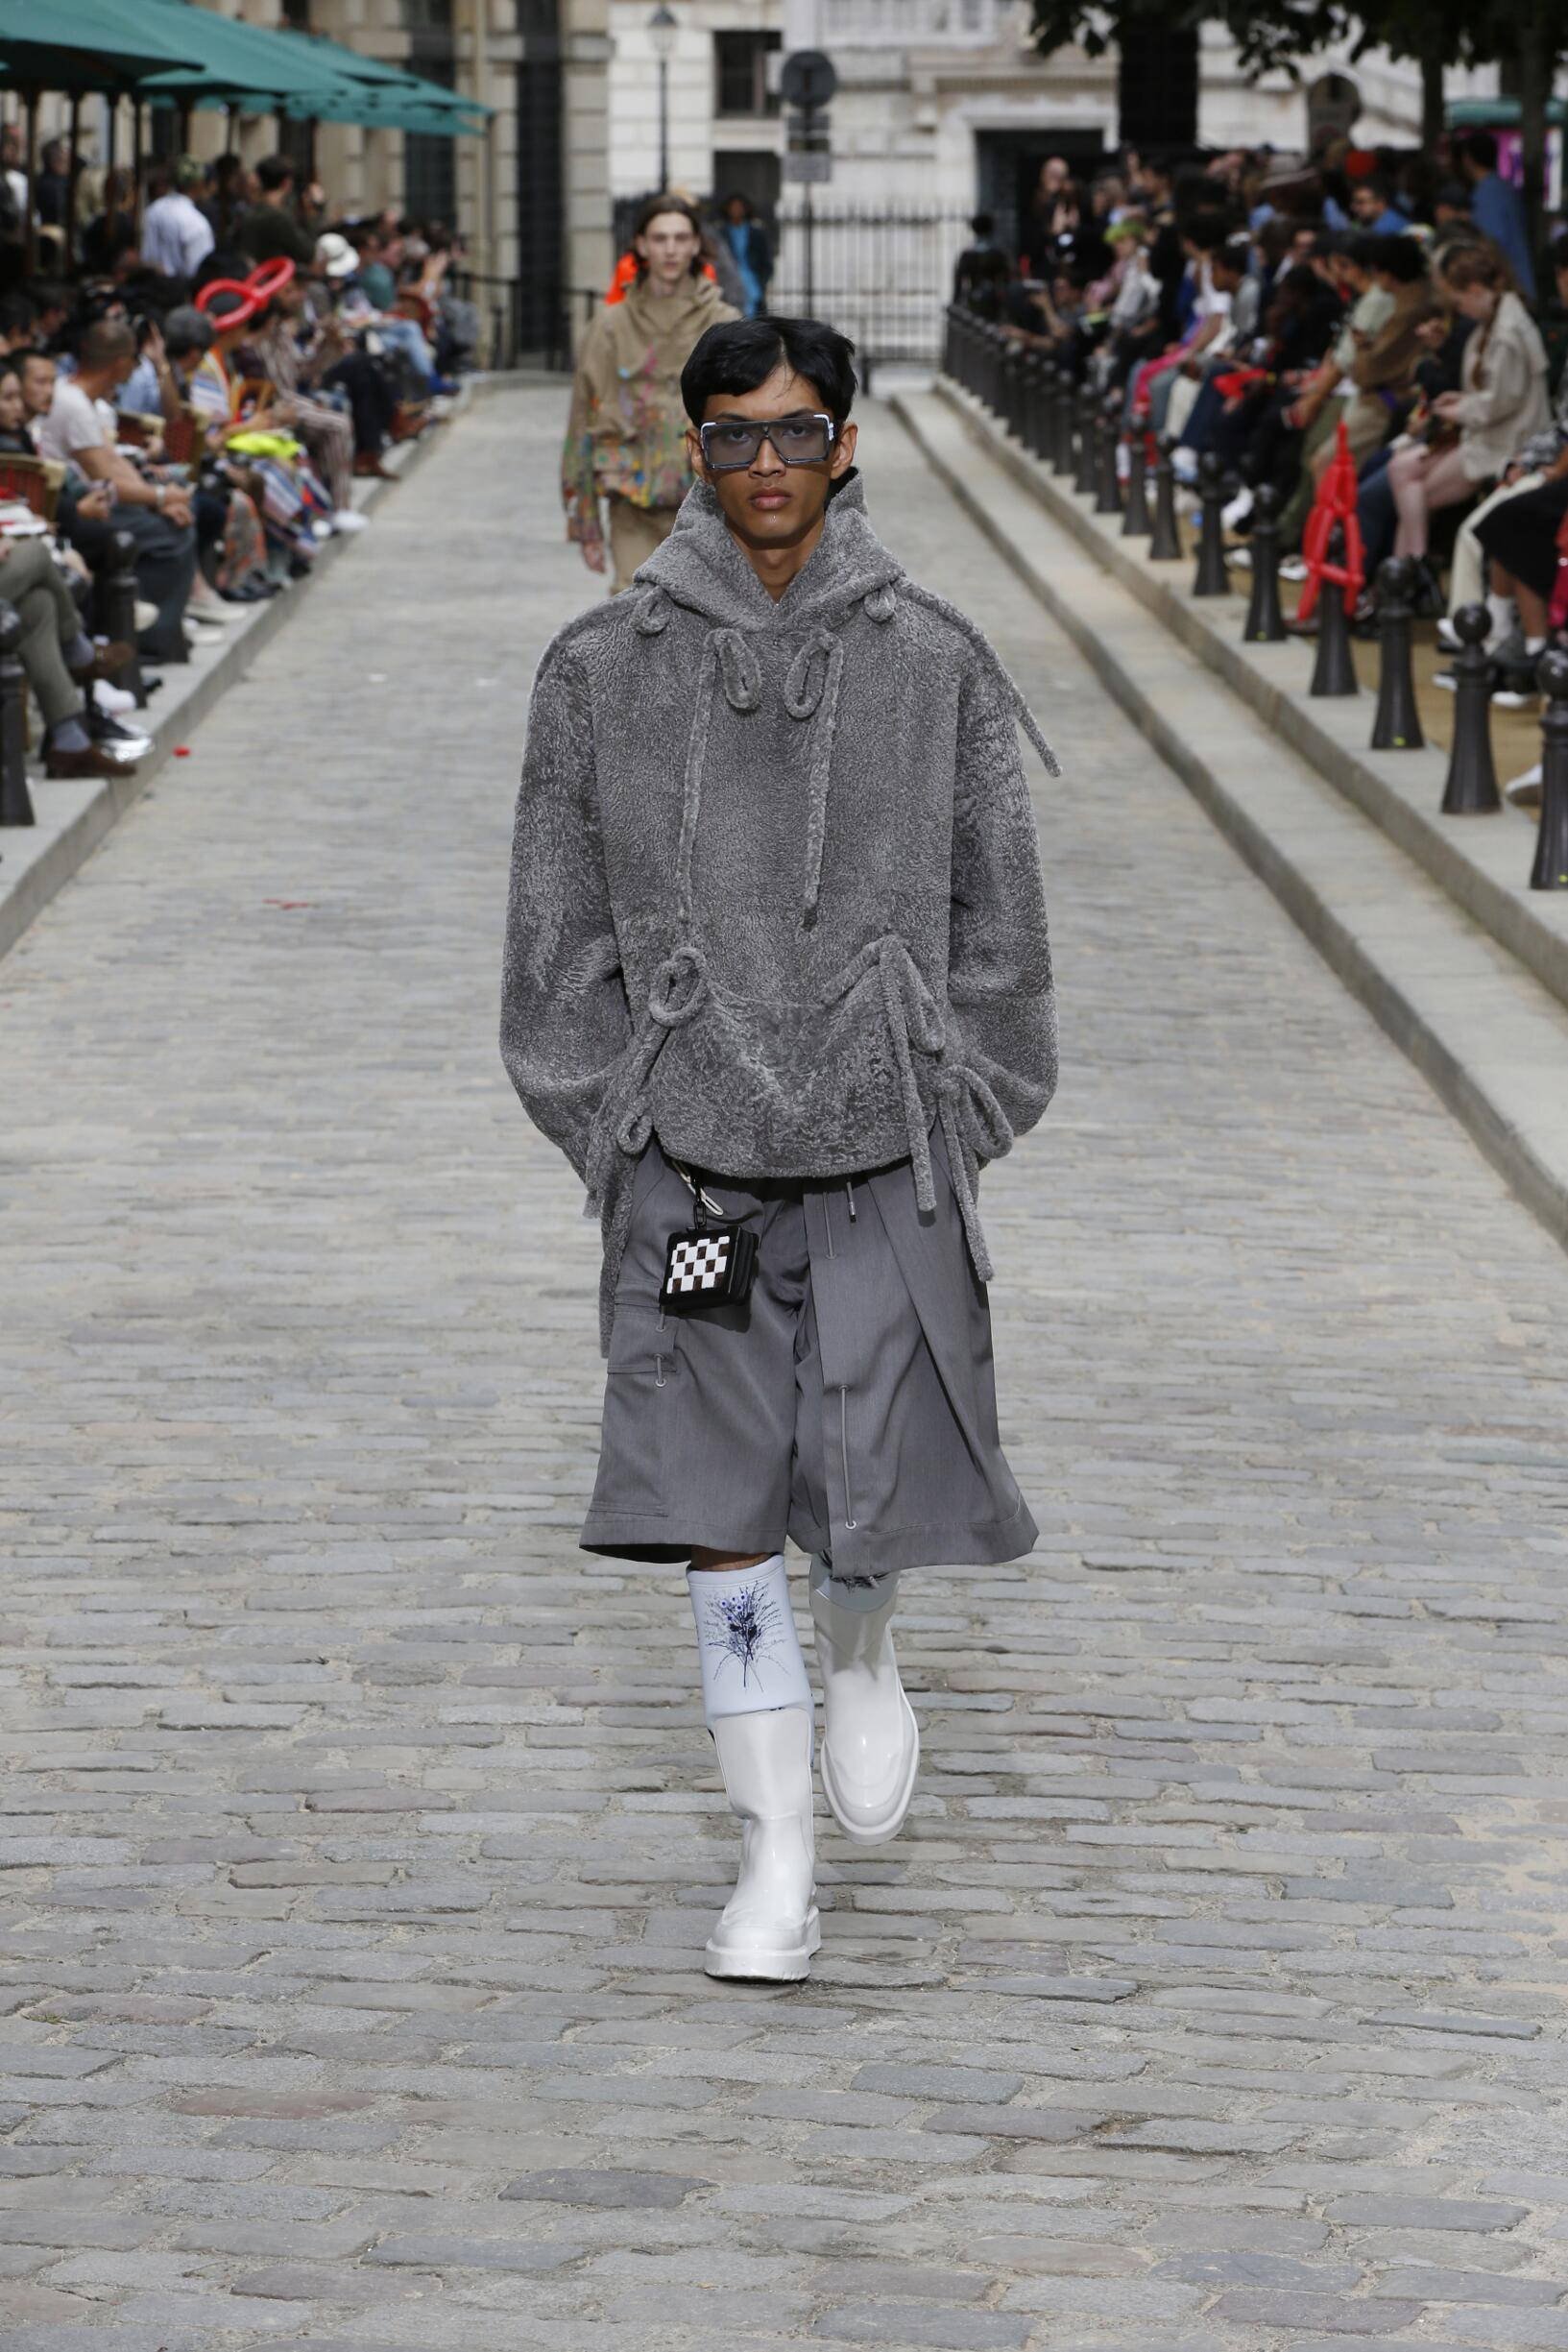 Catwalk Louis Vuitton Man Fashion Show Summer 2020